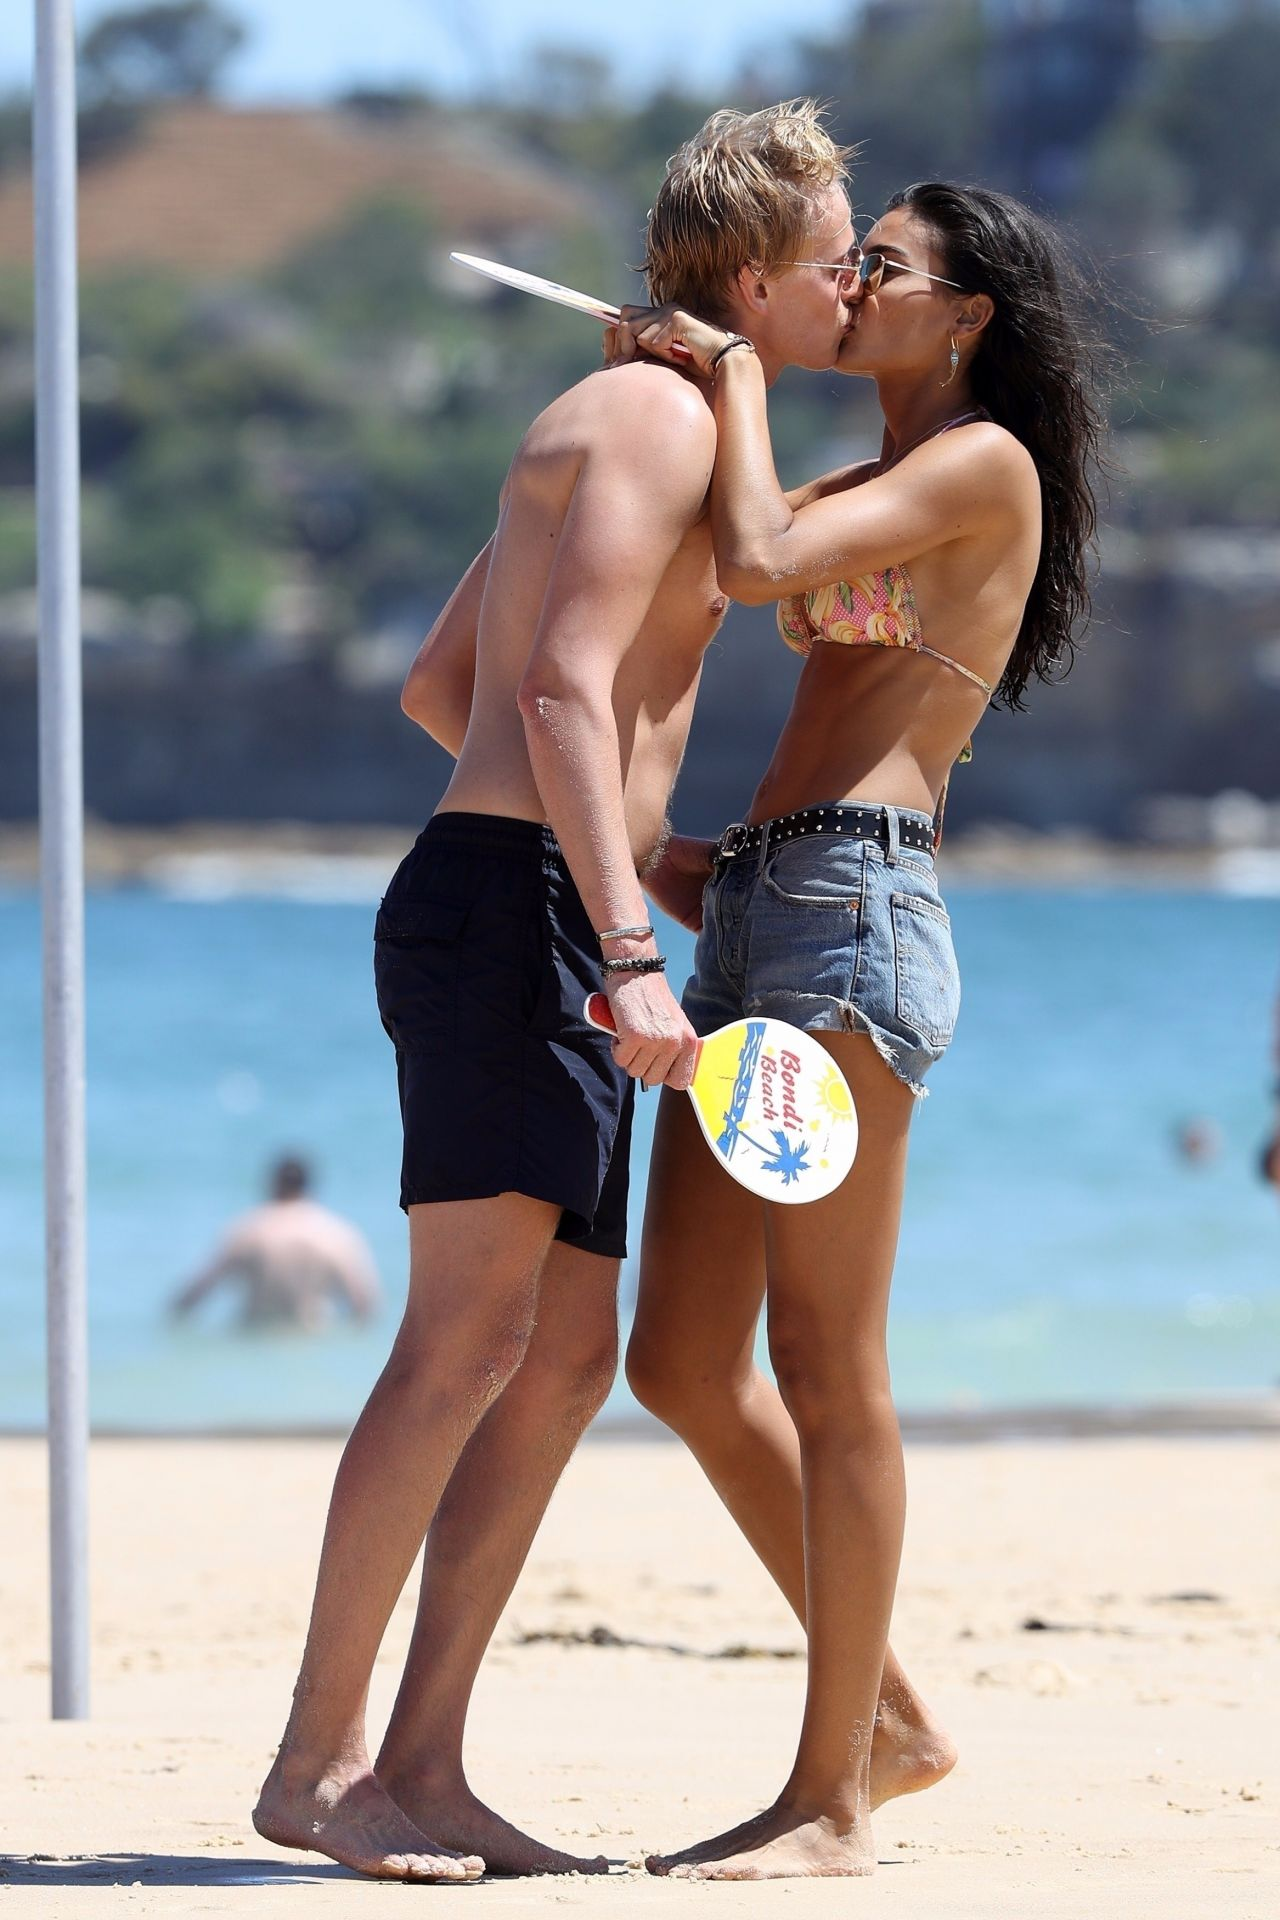 Kelly Gale in Bikini on Bondi Beach in Sydney Pic 28 of 35